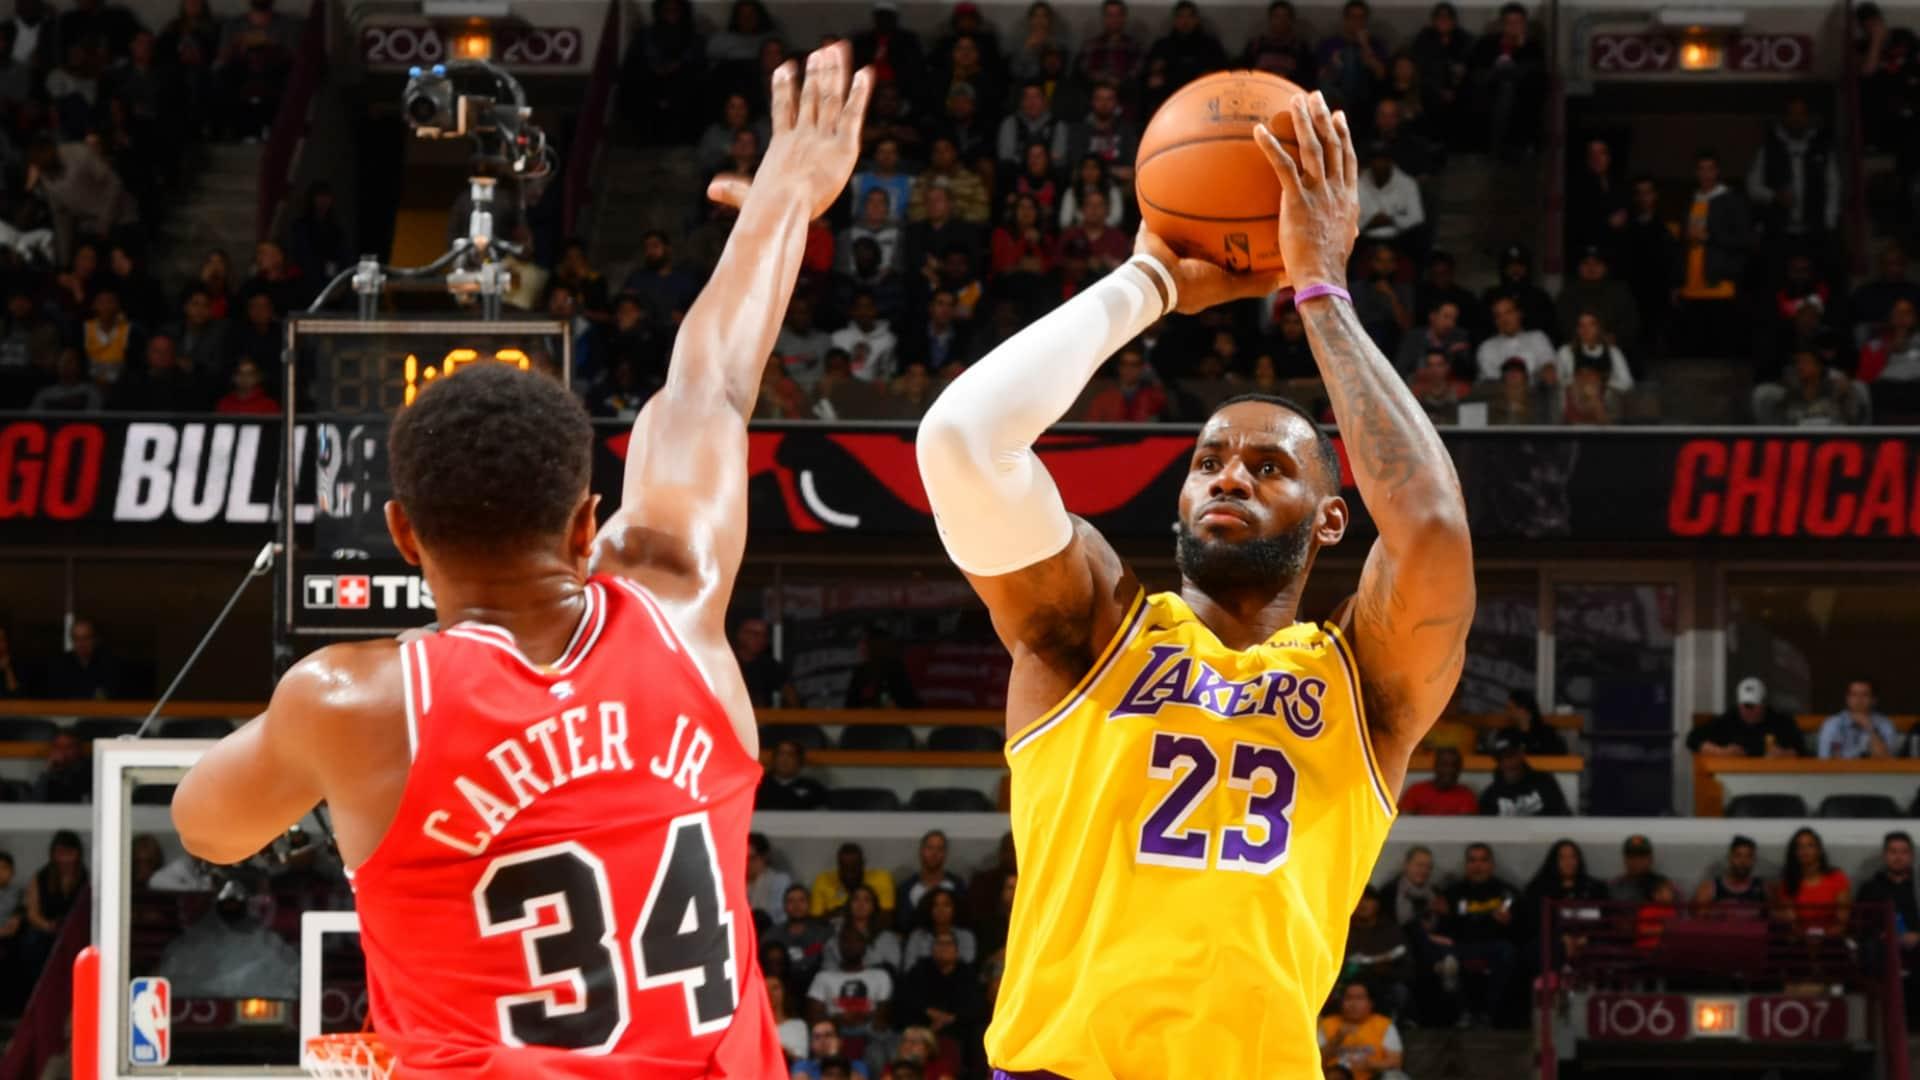 Lakers @ Bulls